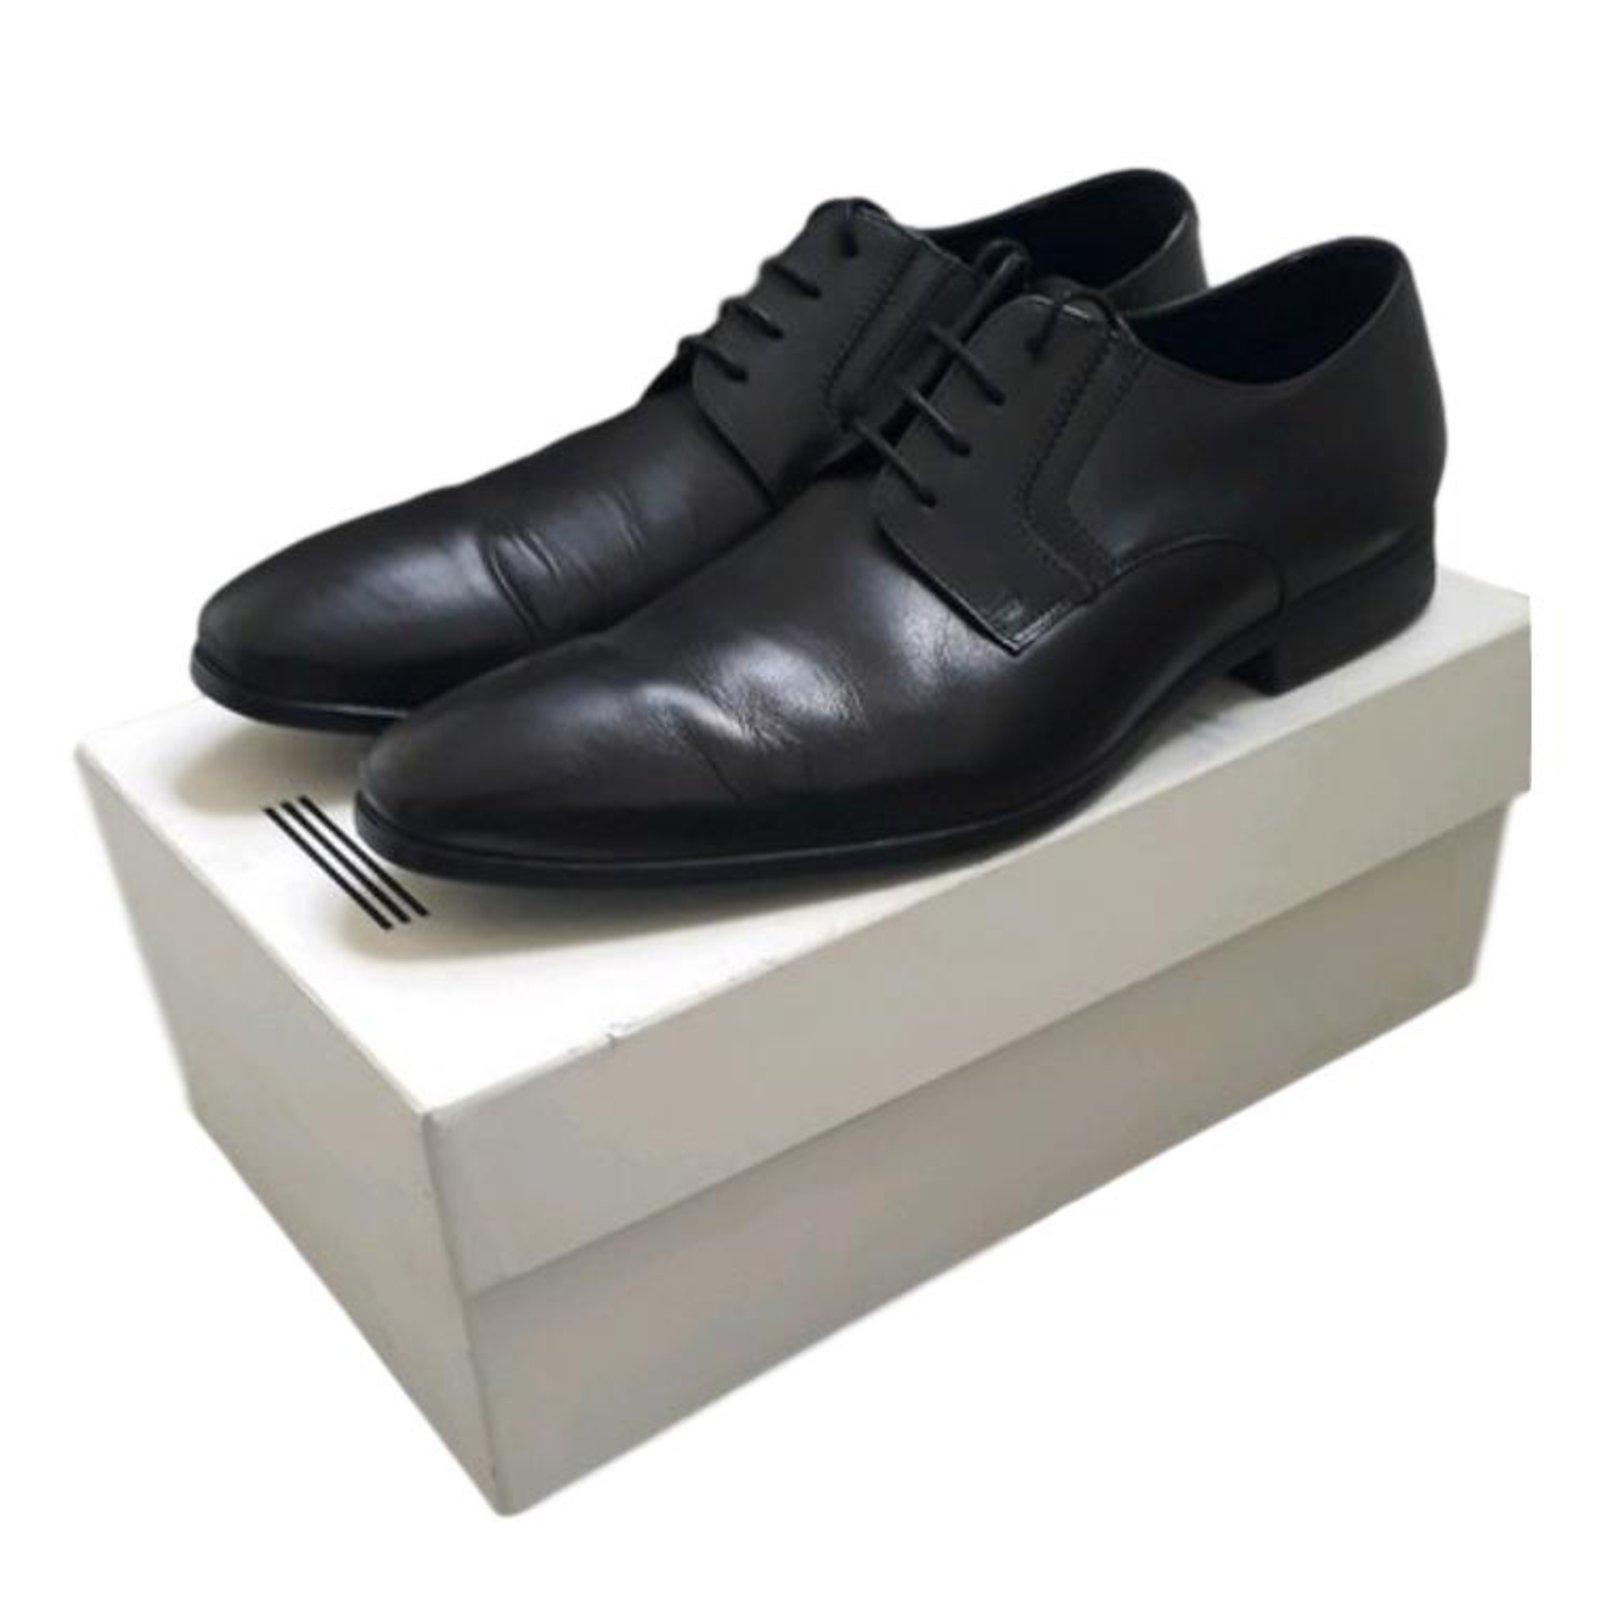 Ref Kenzo 66065 Chaussures Joli Closet Mocassins Homme Noir Cuir X5RSSq